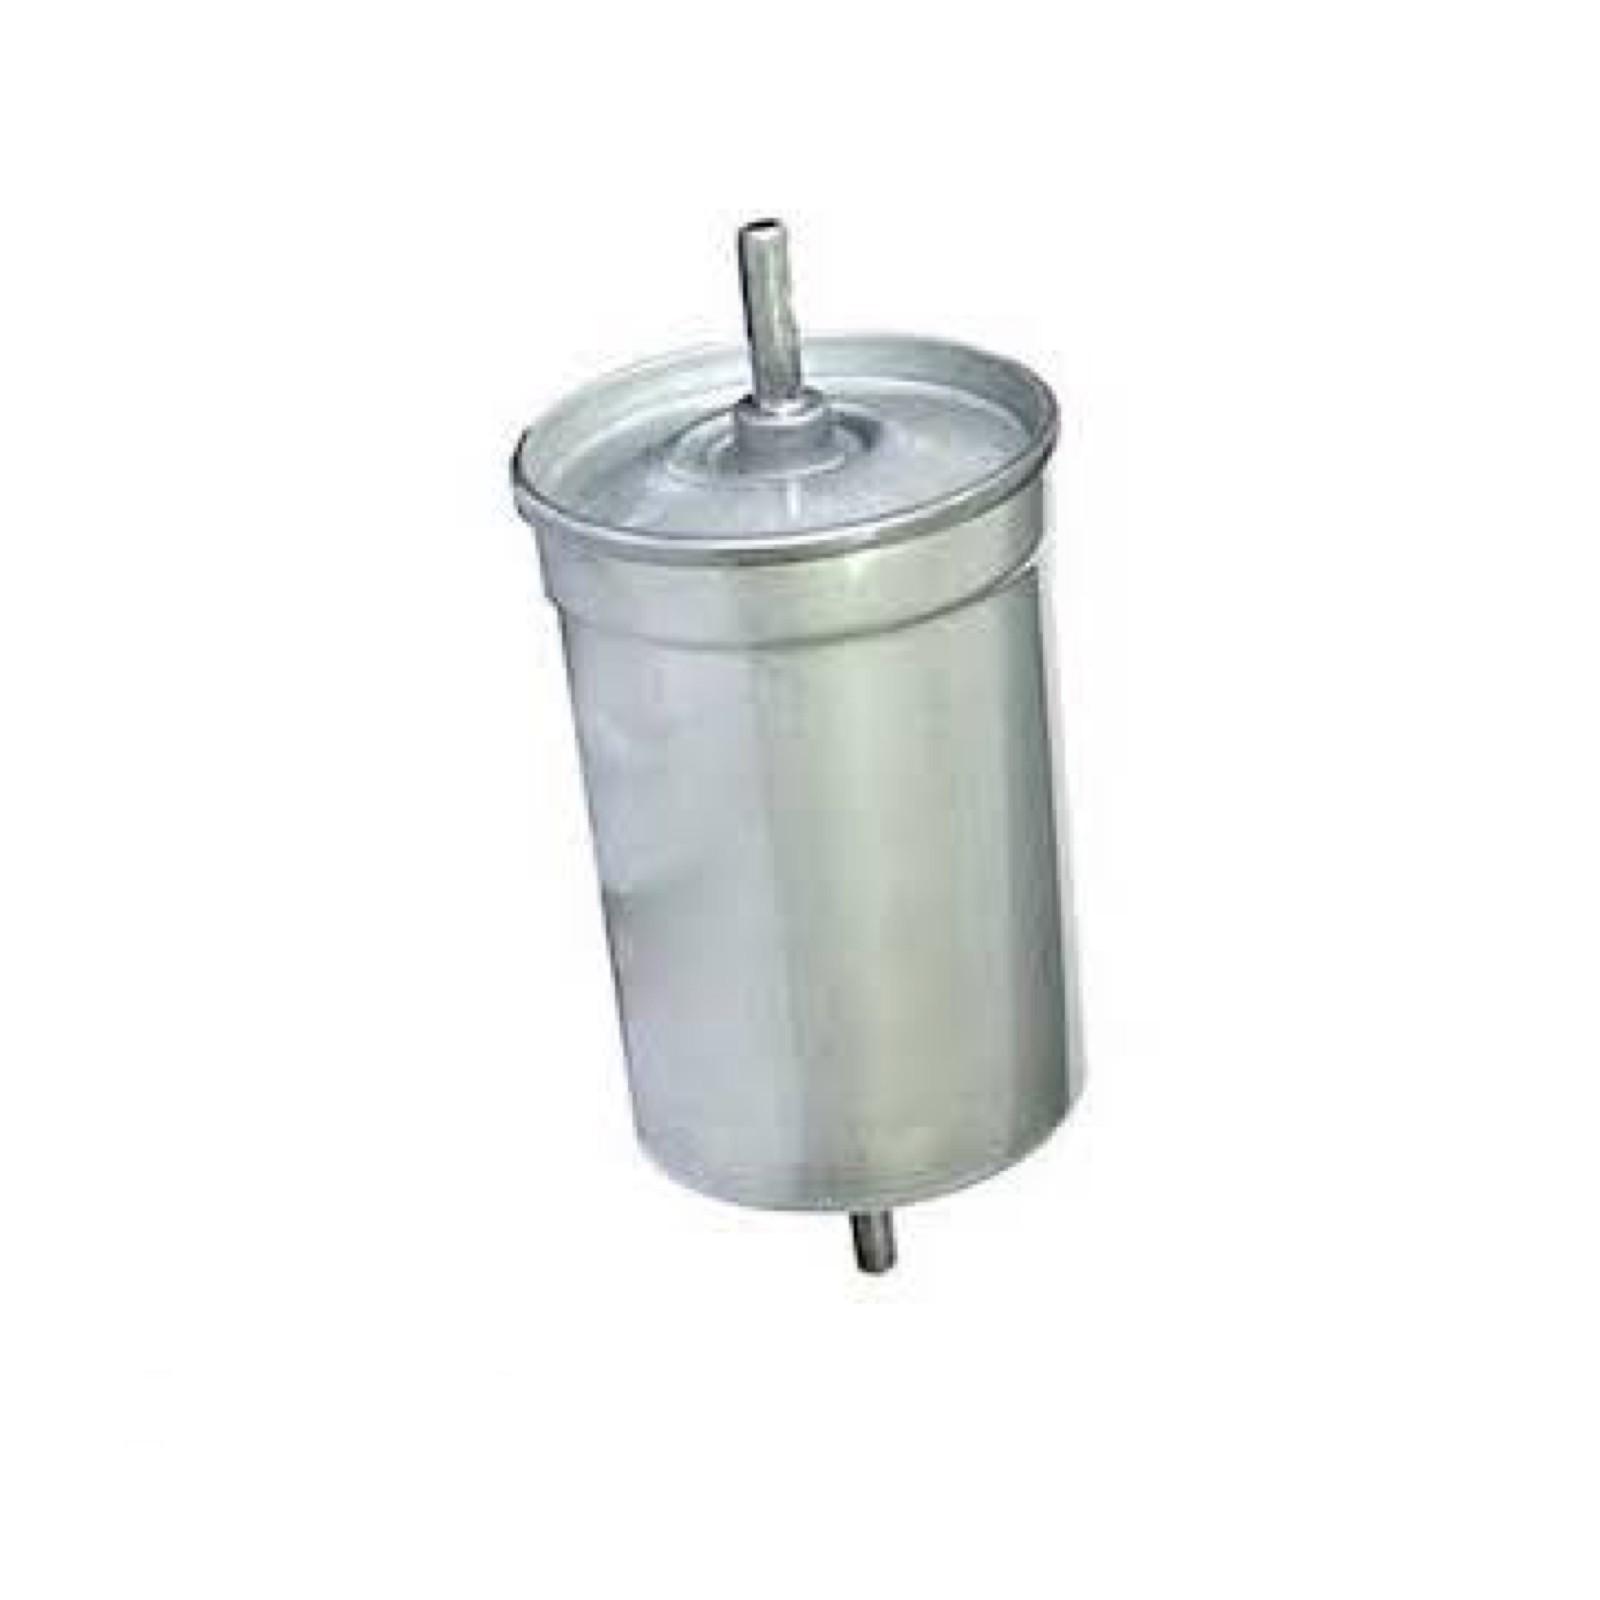 Fuel Filter Volvo S60 S80 V70 S40 V40 Xc70 30817997 Ebay 940 Location 514 323 0005